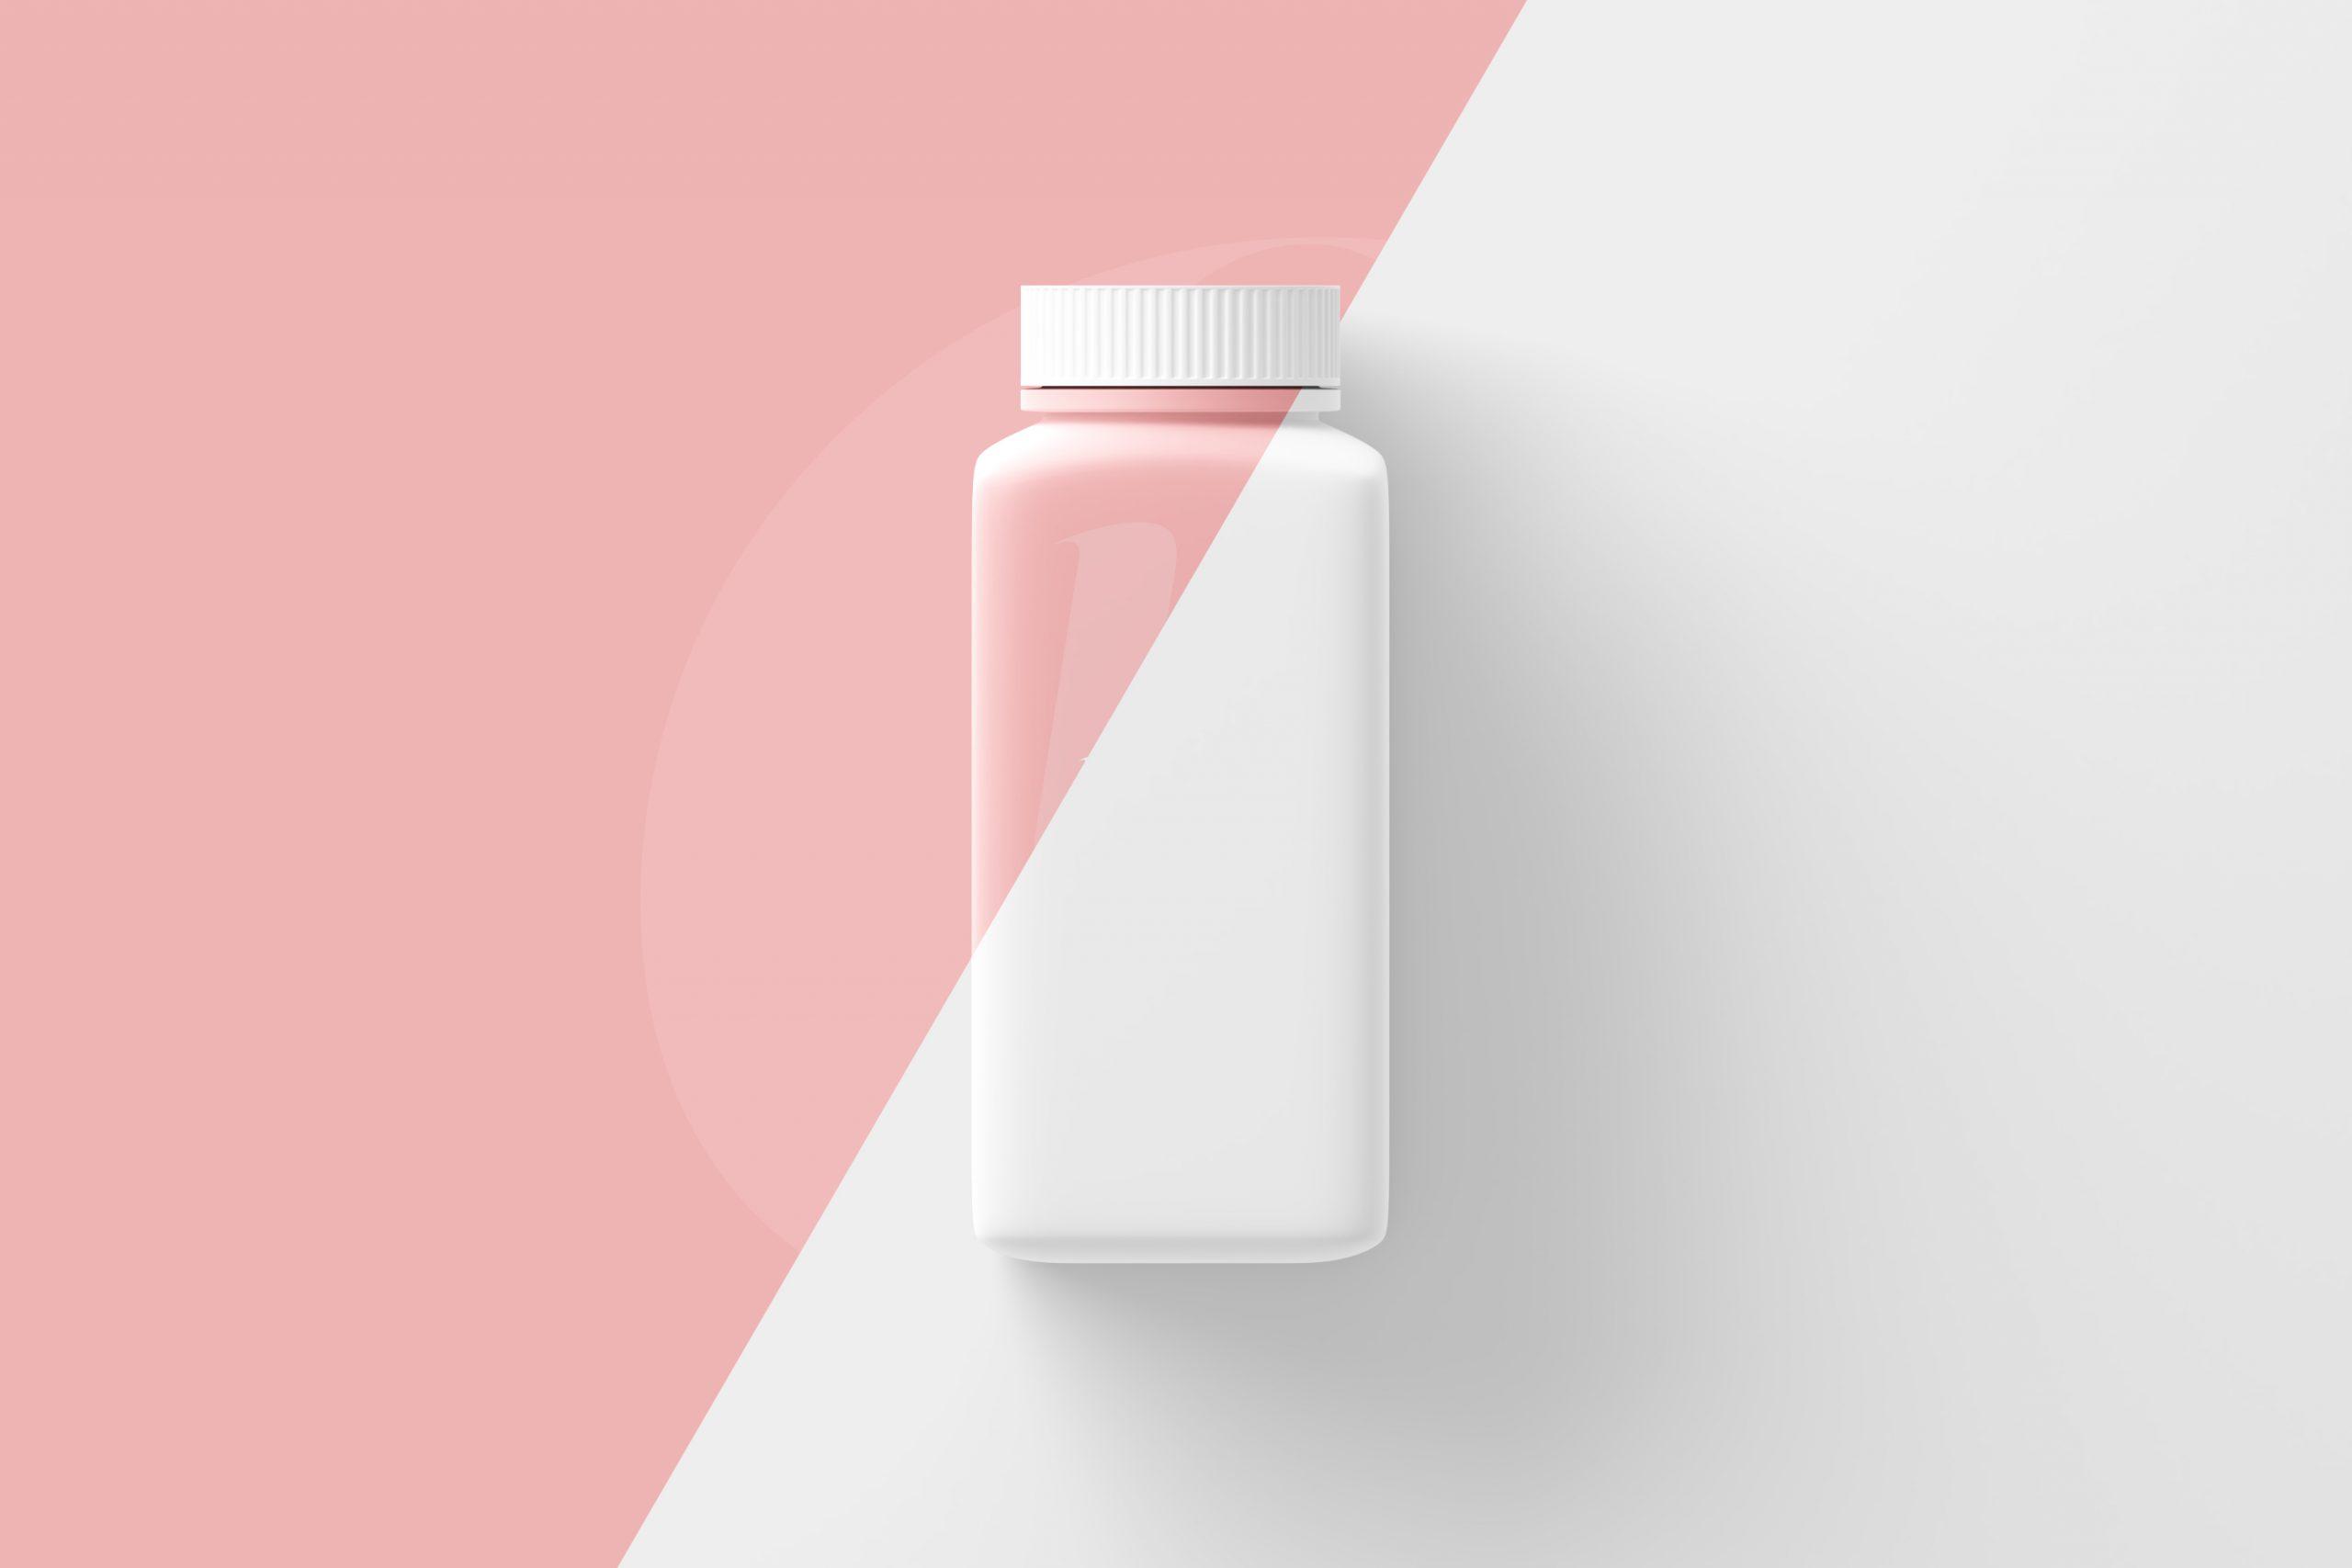 Long Square Pill Bottle Mockup